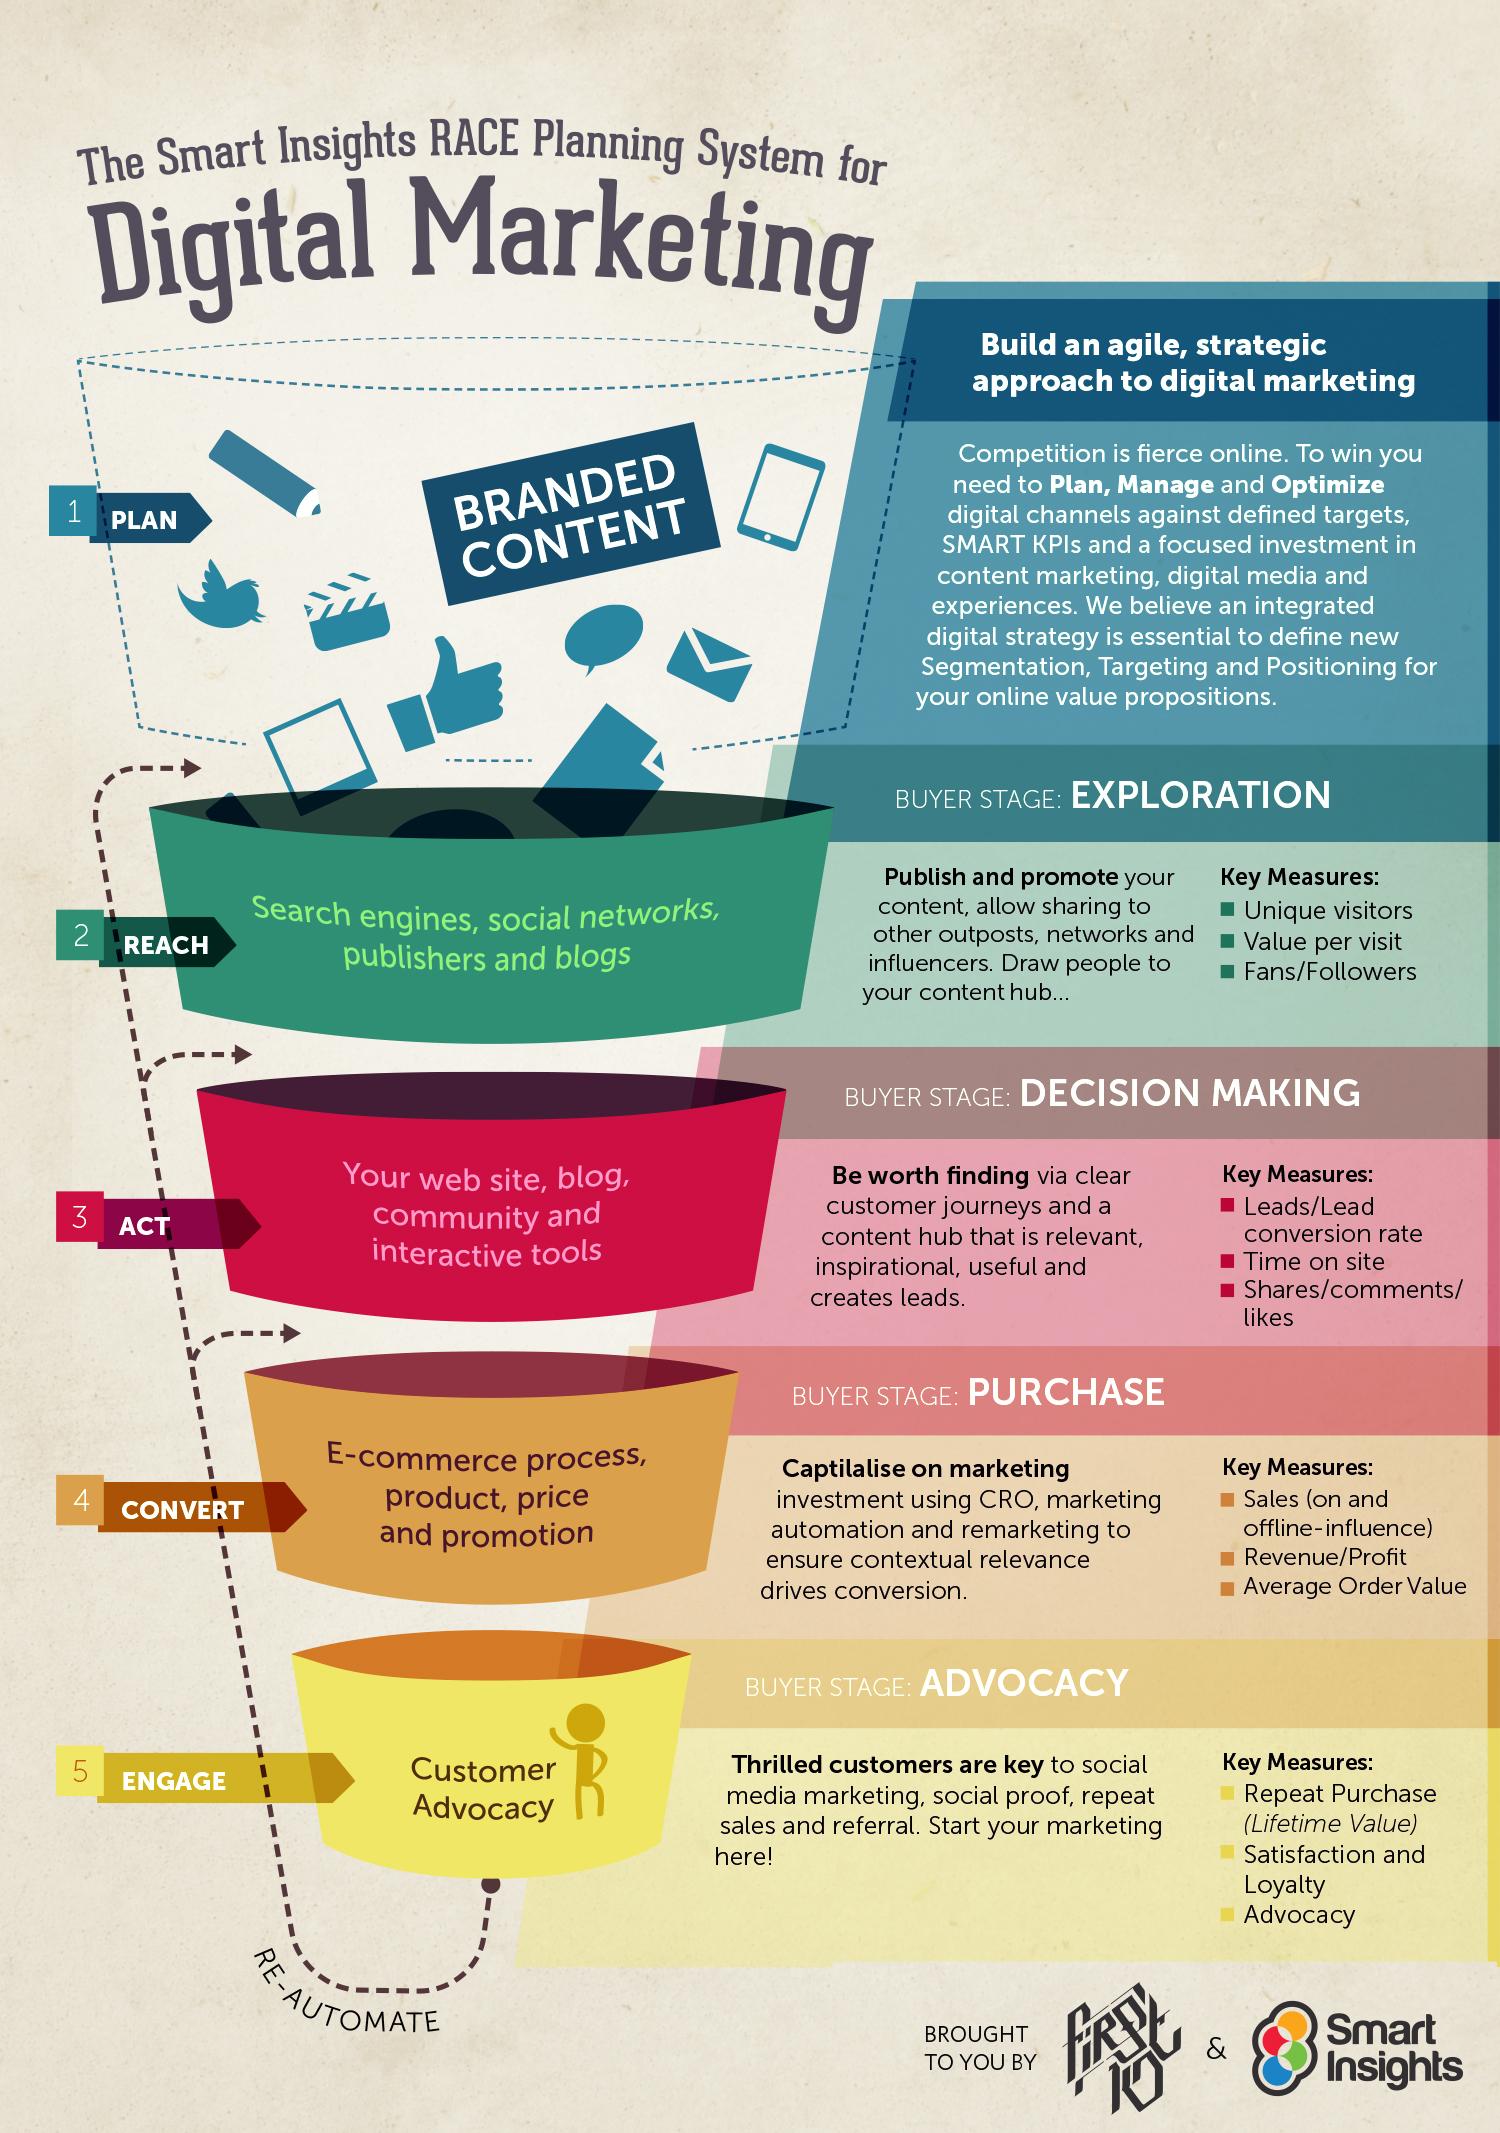 Digital Strategy - The RACE framework